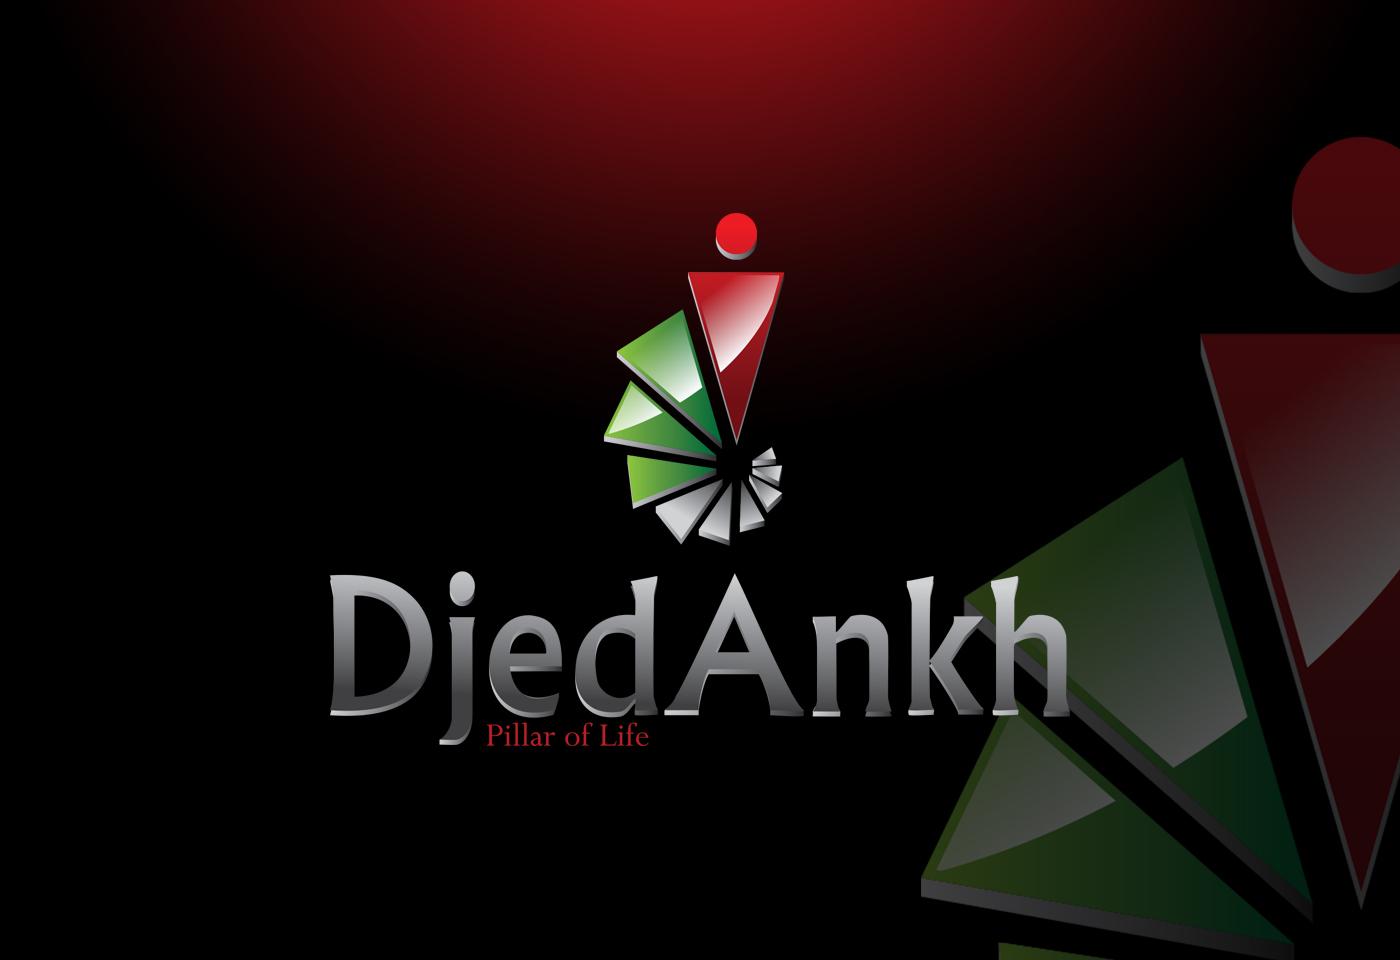 DjedAnkh Network